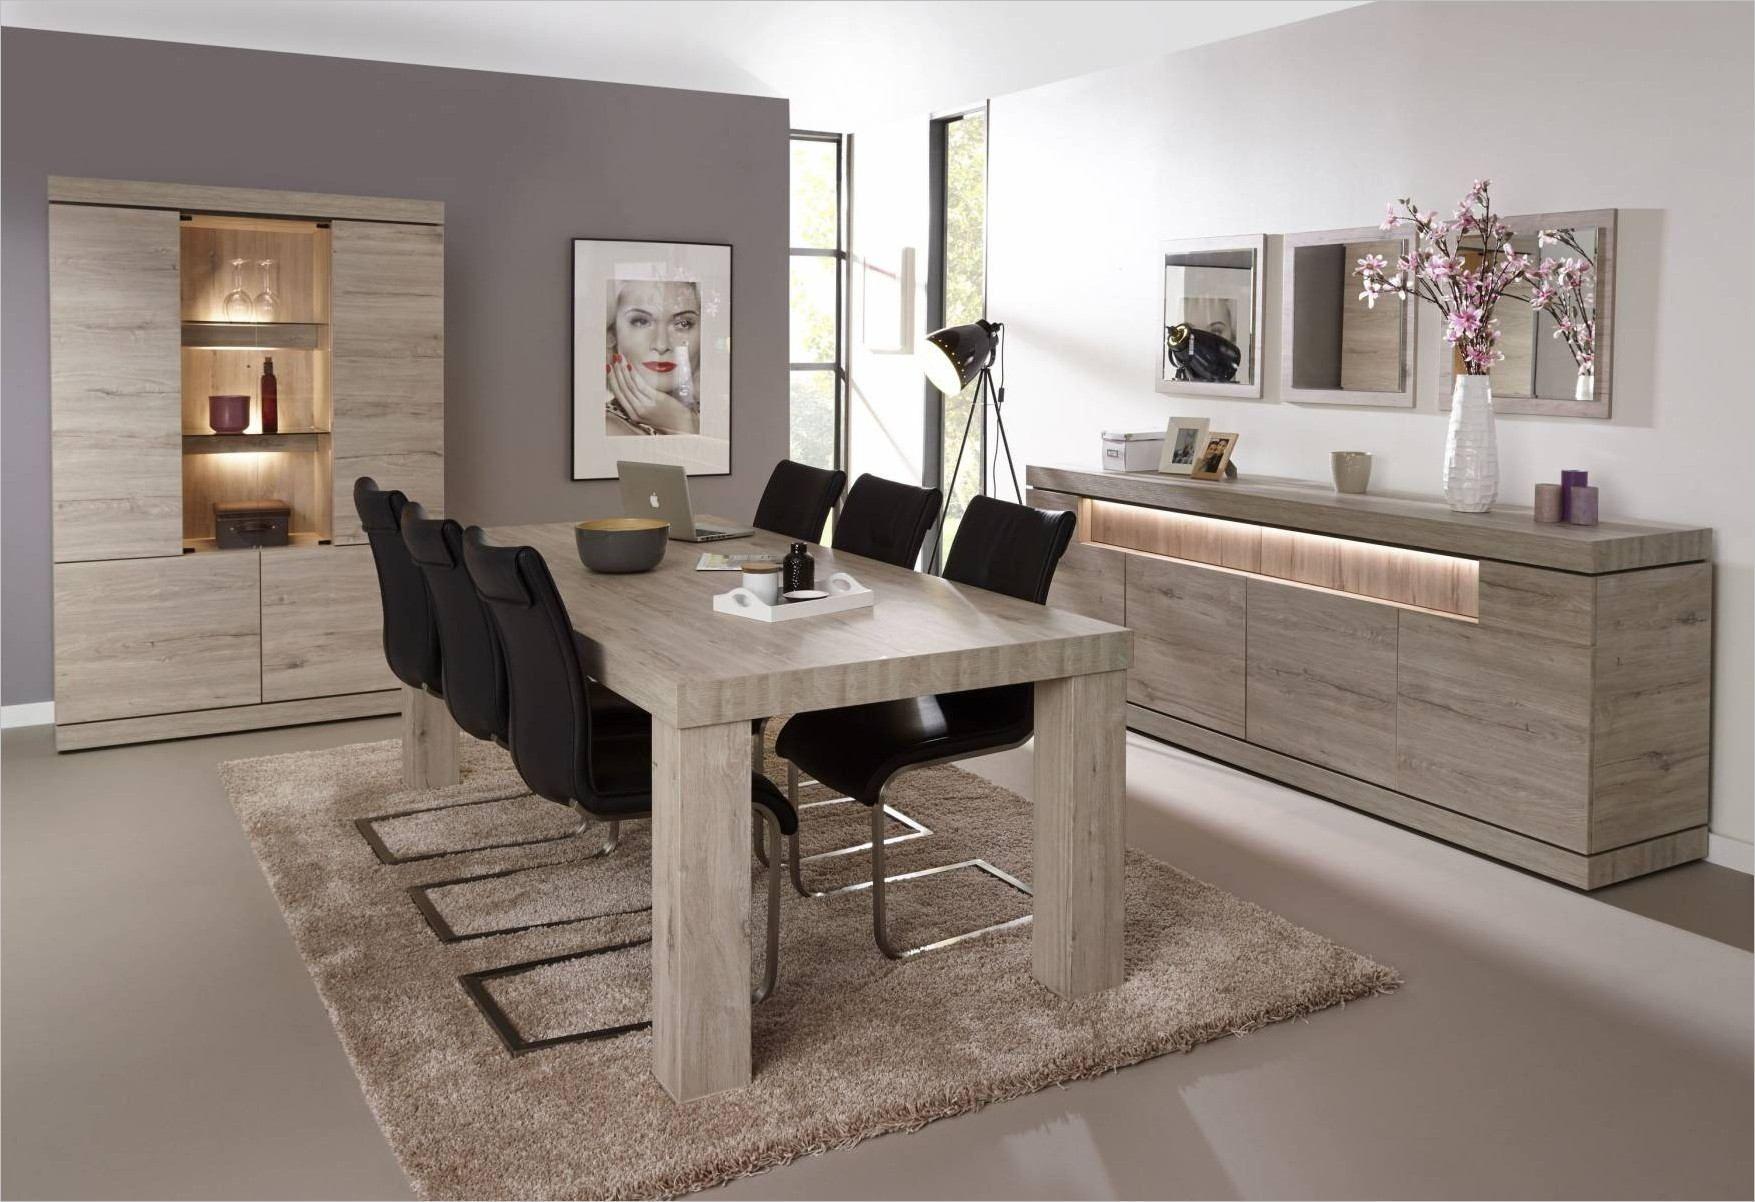 bois clair moderne but dining room